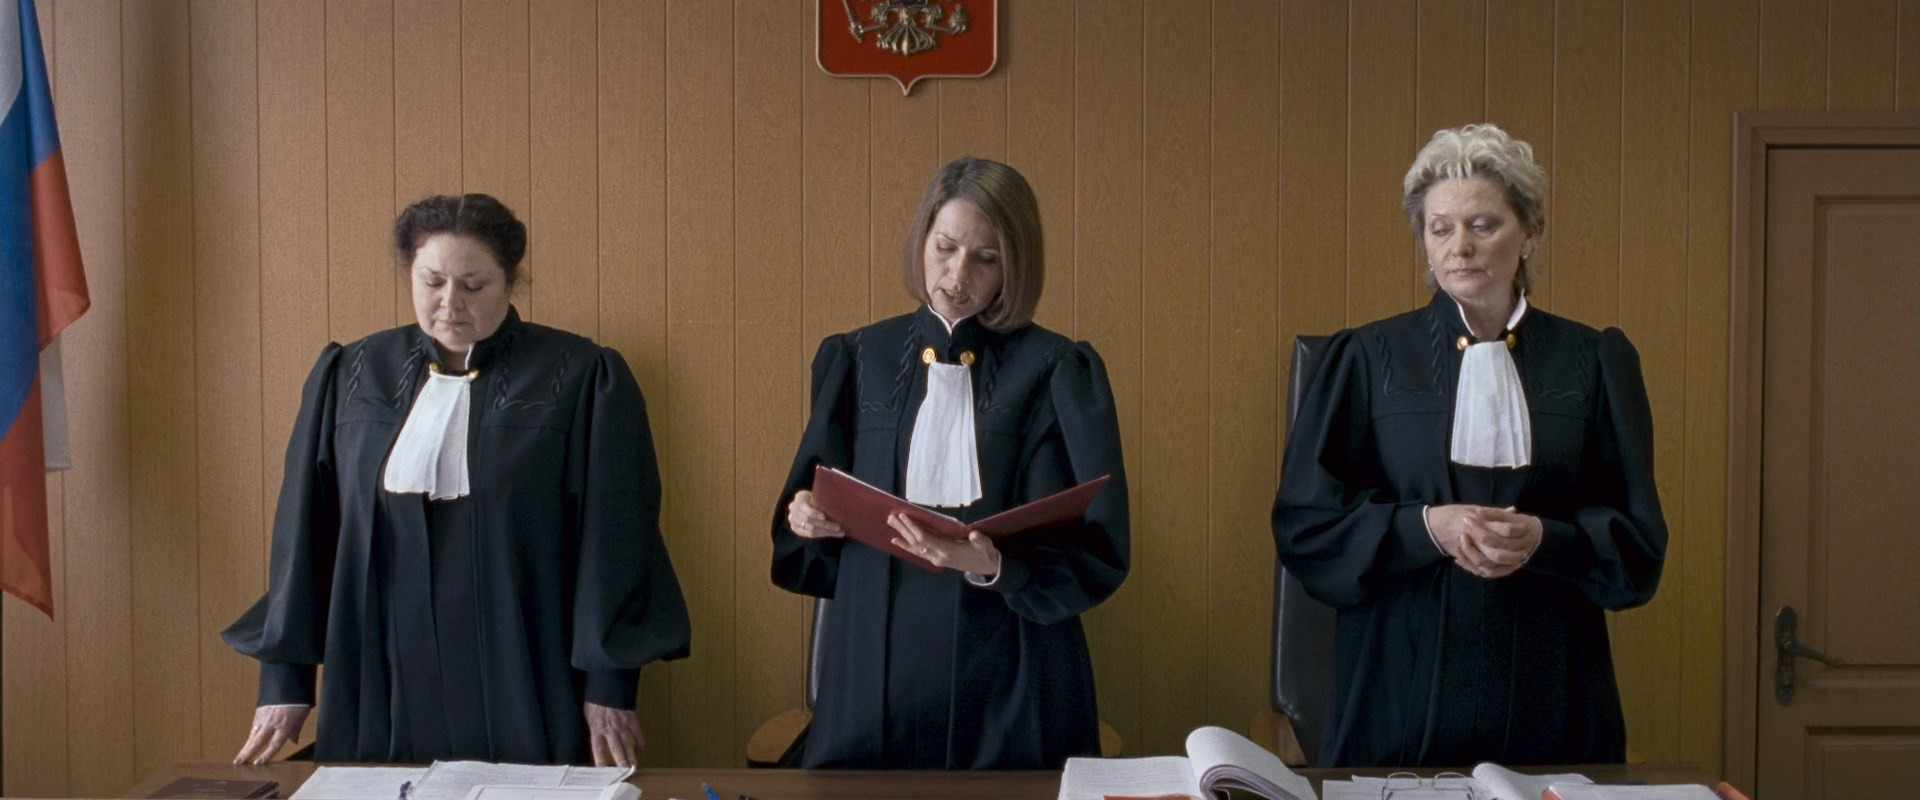 Женщина судья